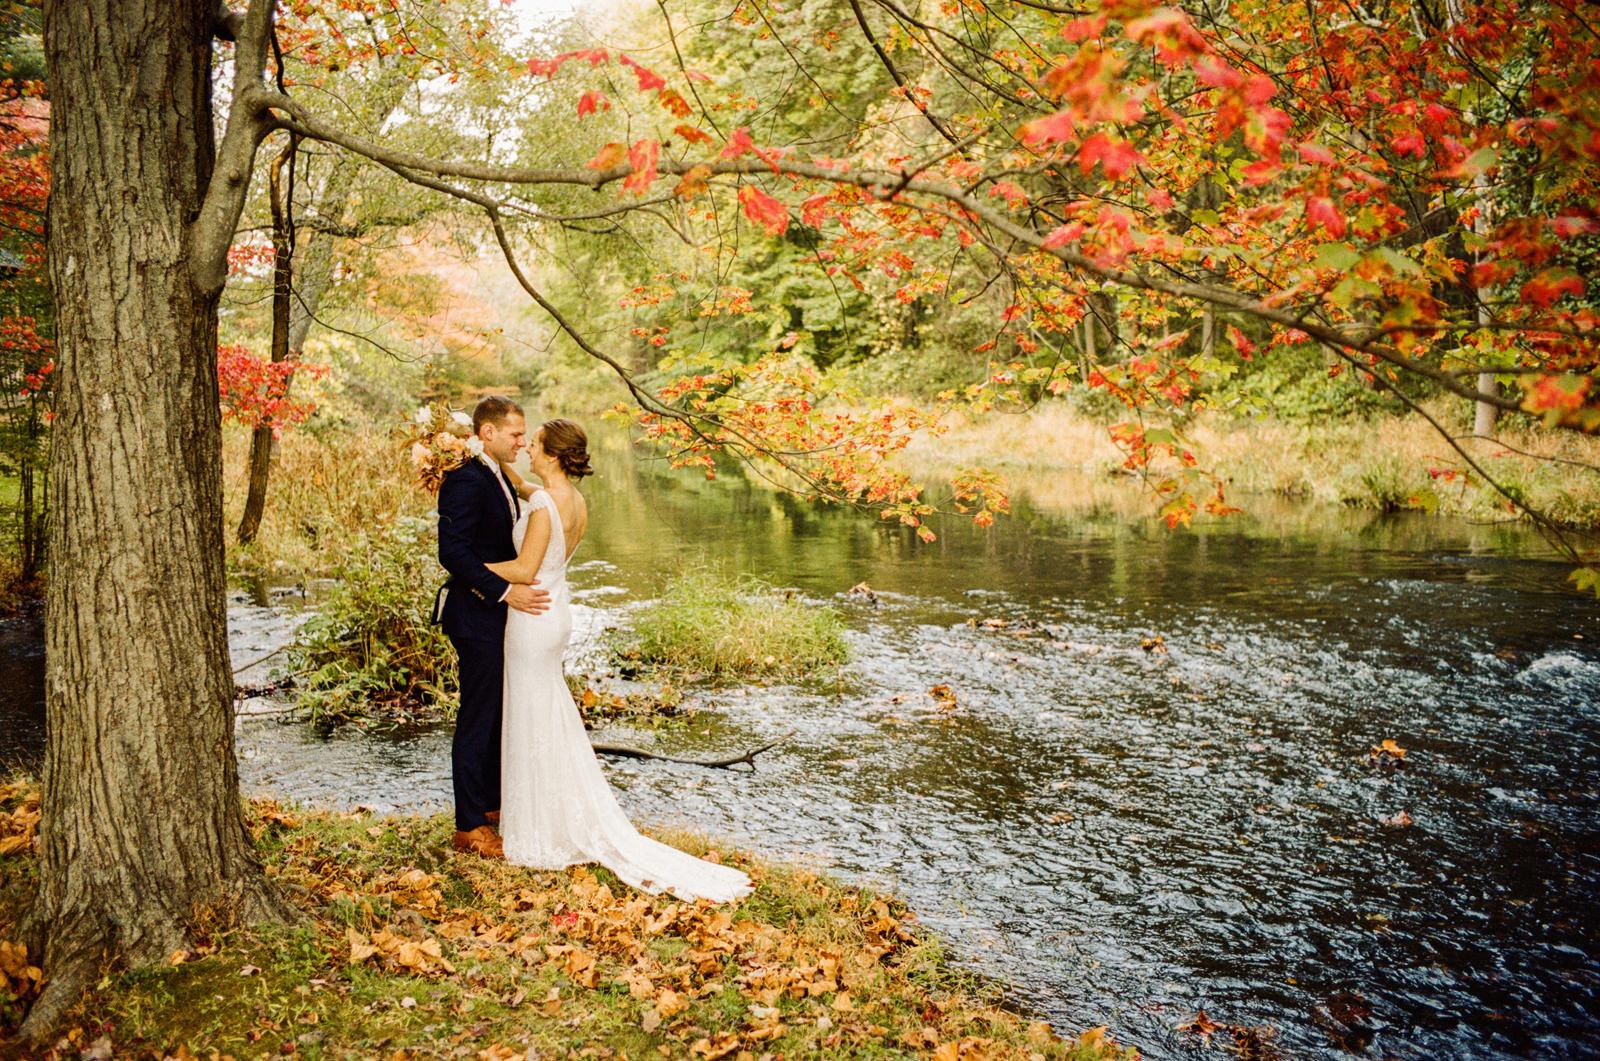 bridgeport-wedding-105 BRIDGEPORT, CONNECTICUT BACKYARD WEDDING